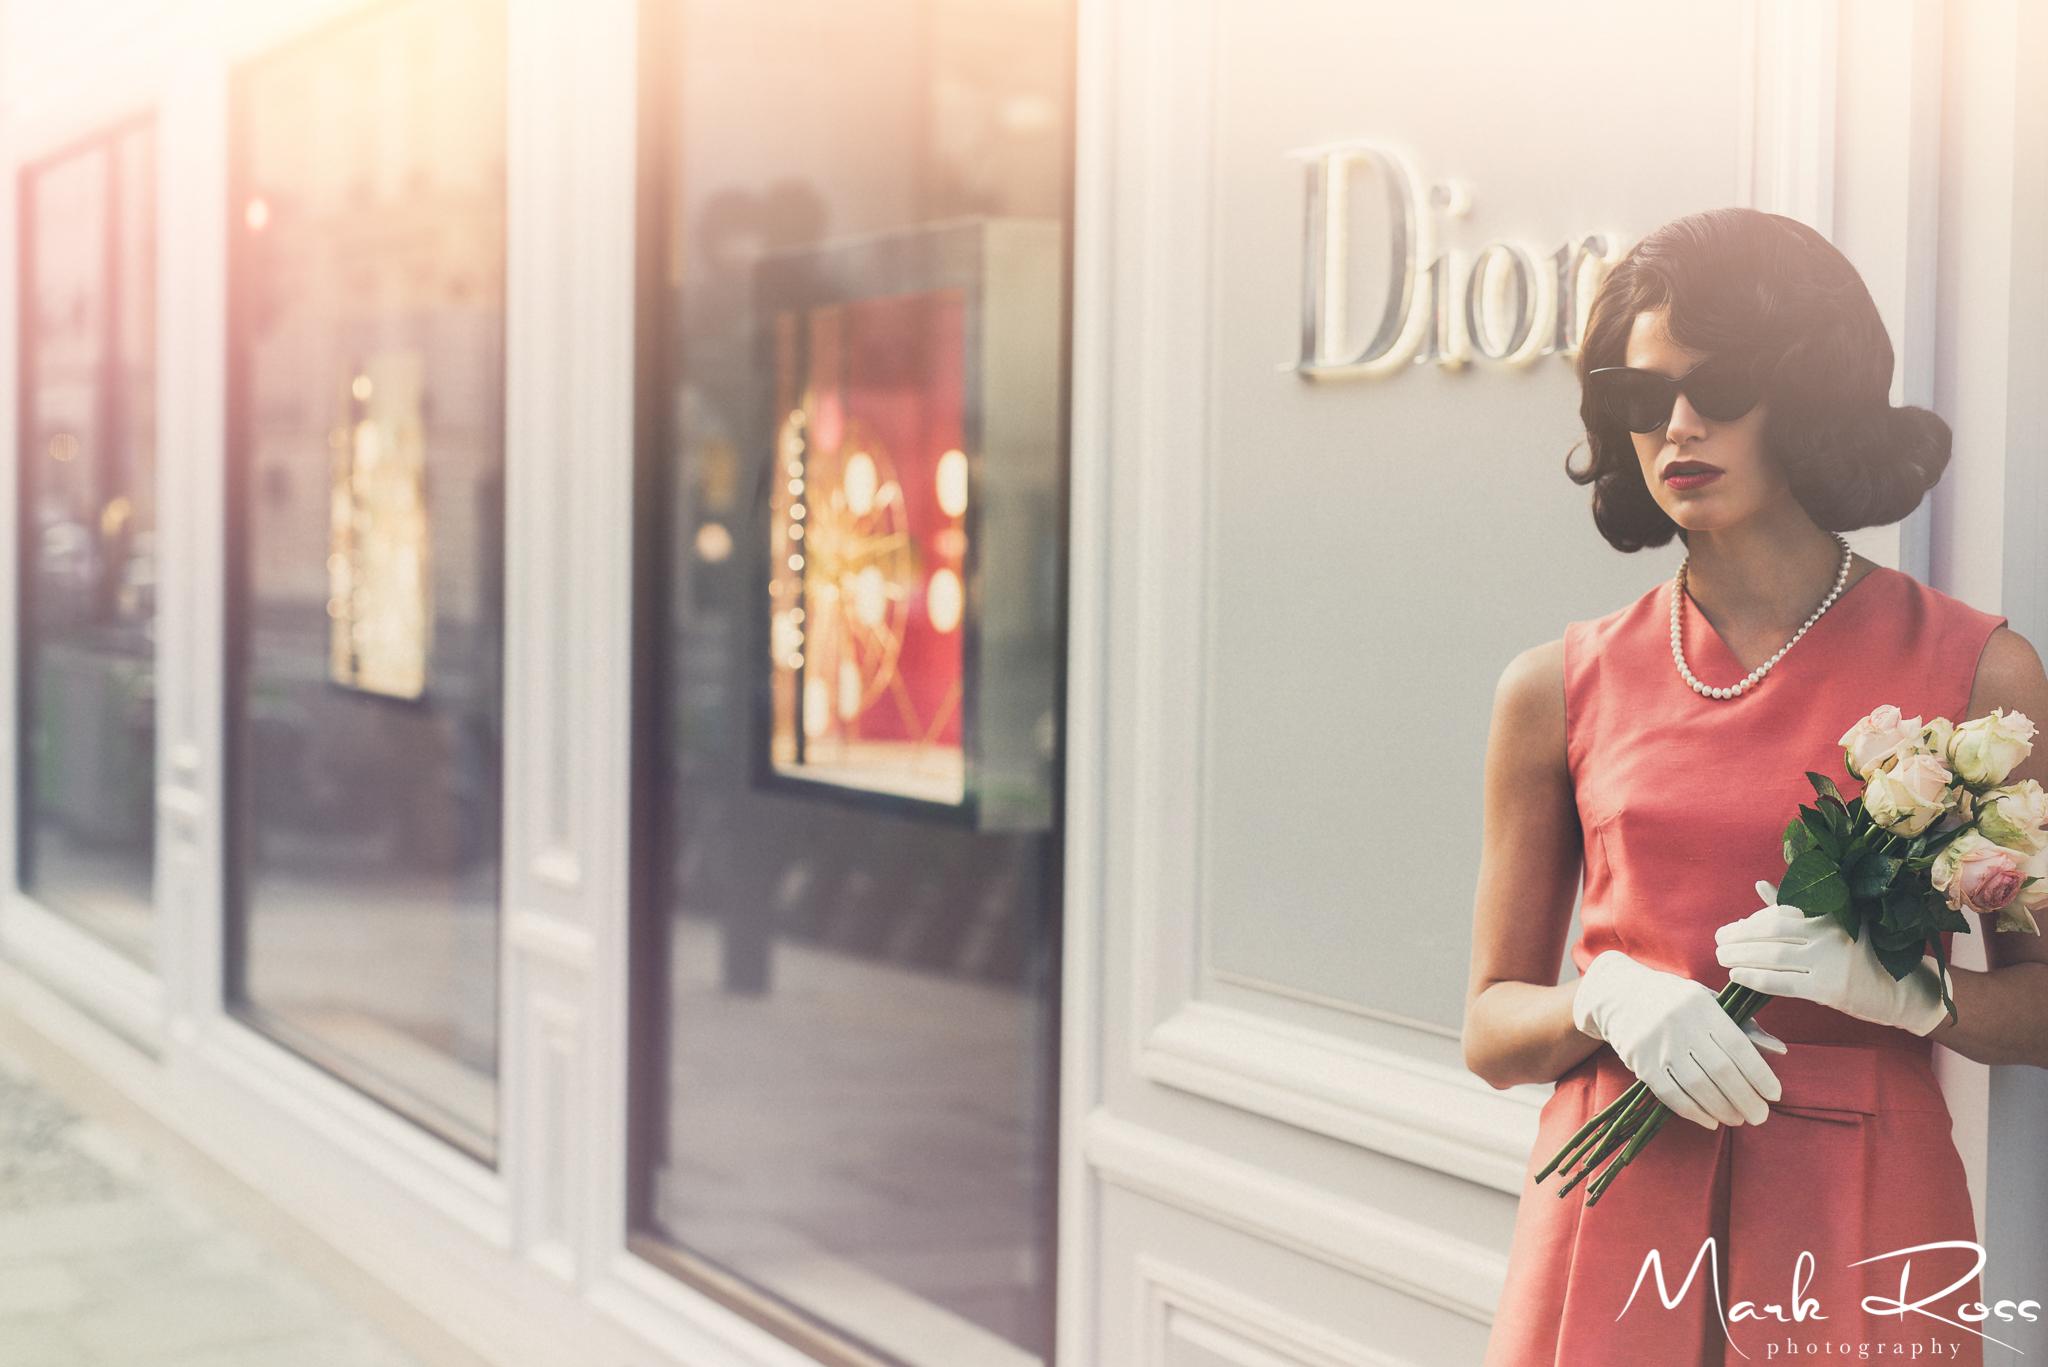 Denver-Portrait-Photographer-Mark-Ross-Photography-Maggie-Paris-2018-Jackie-O-Web-Resolution-Watermarked-6.JPG